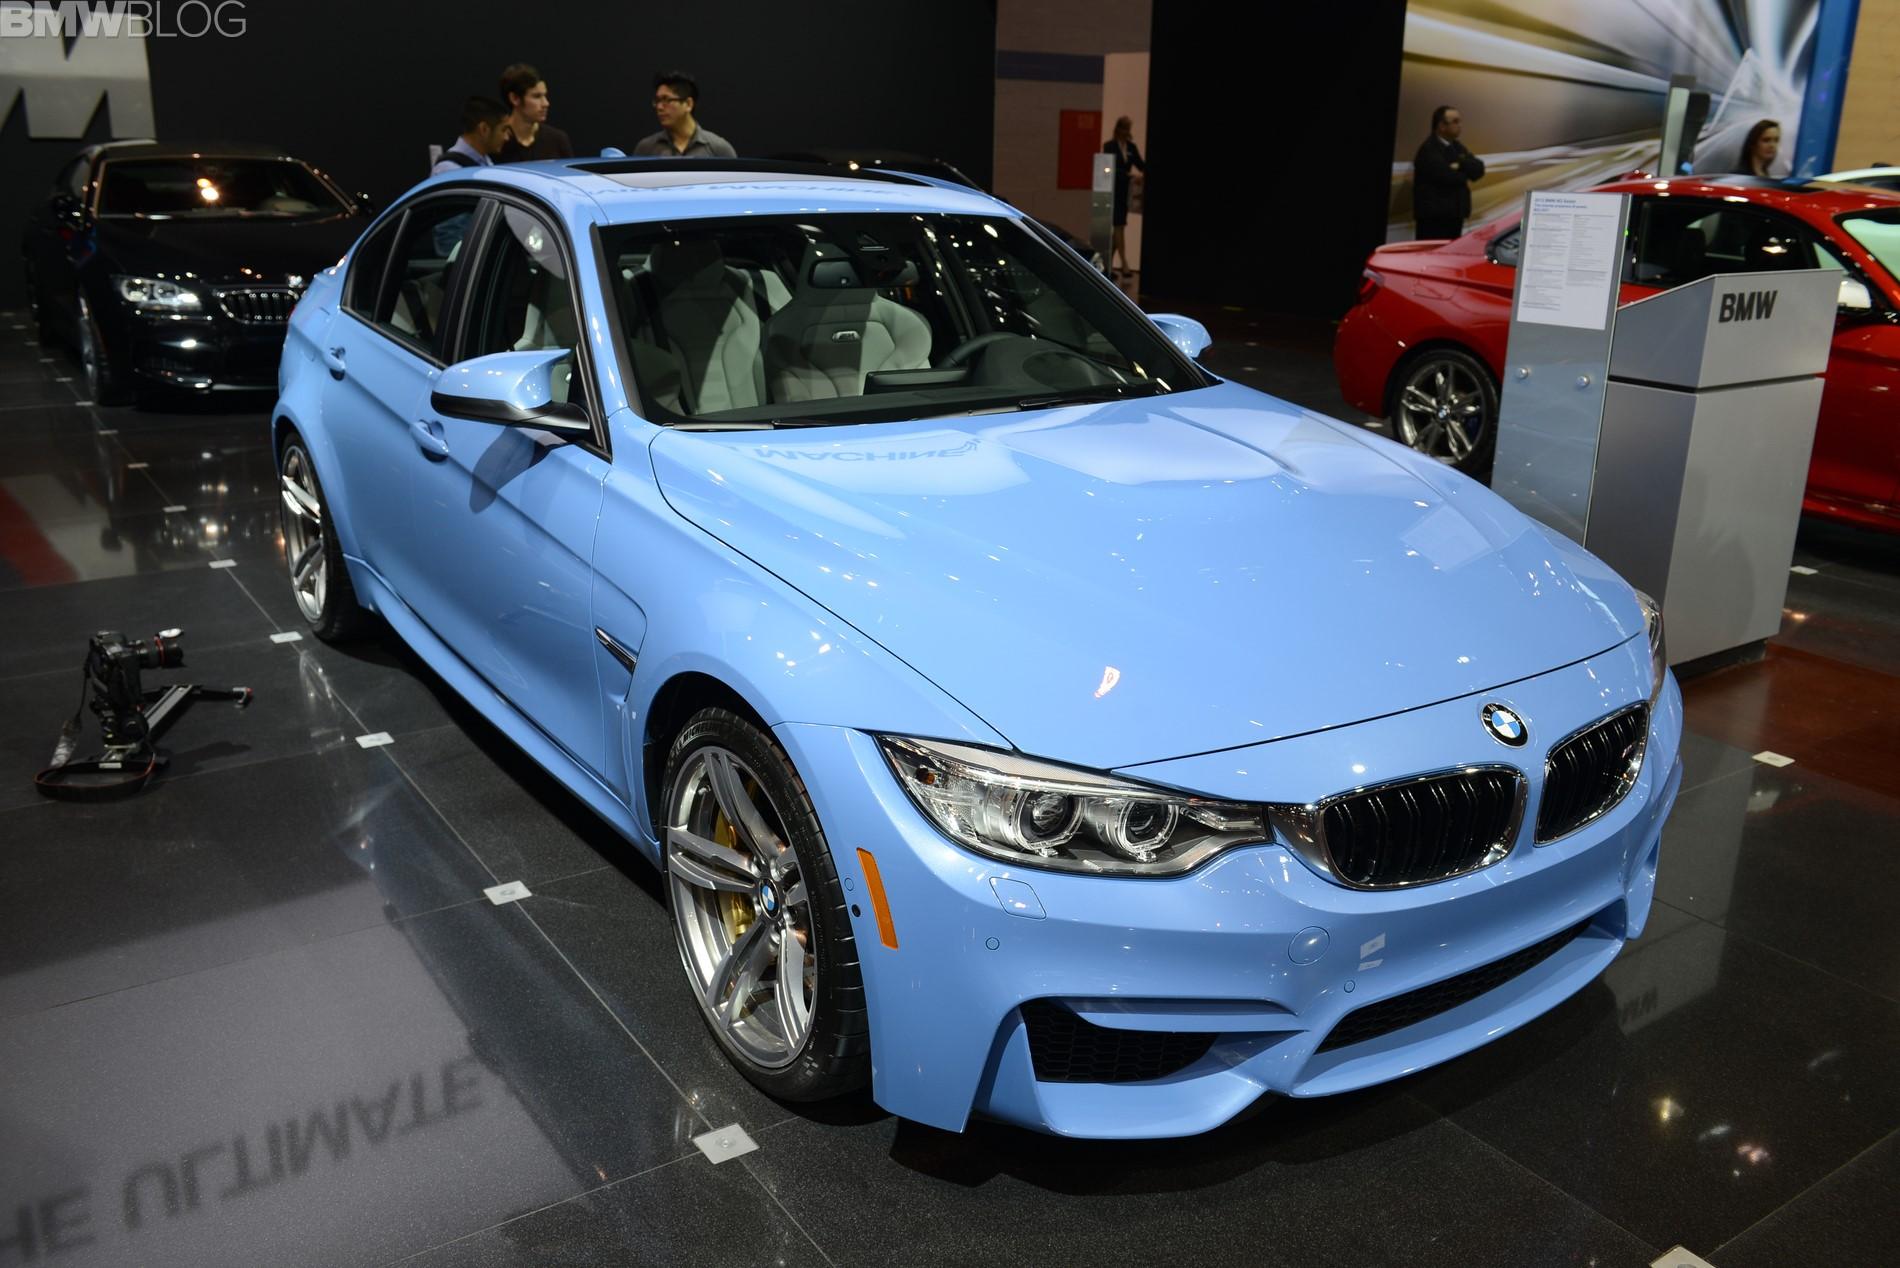 2015 bmw m3 chicago auto show 01